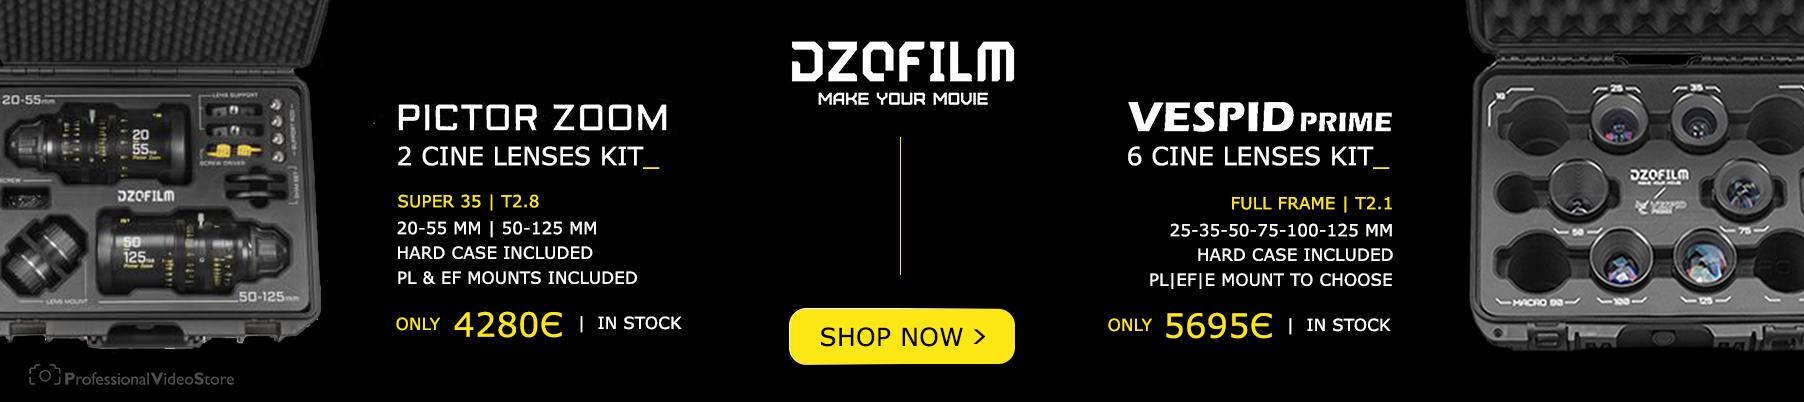 Dzofilm Lenses Kit